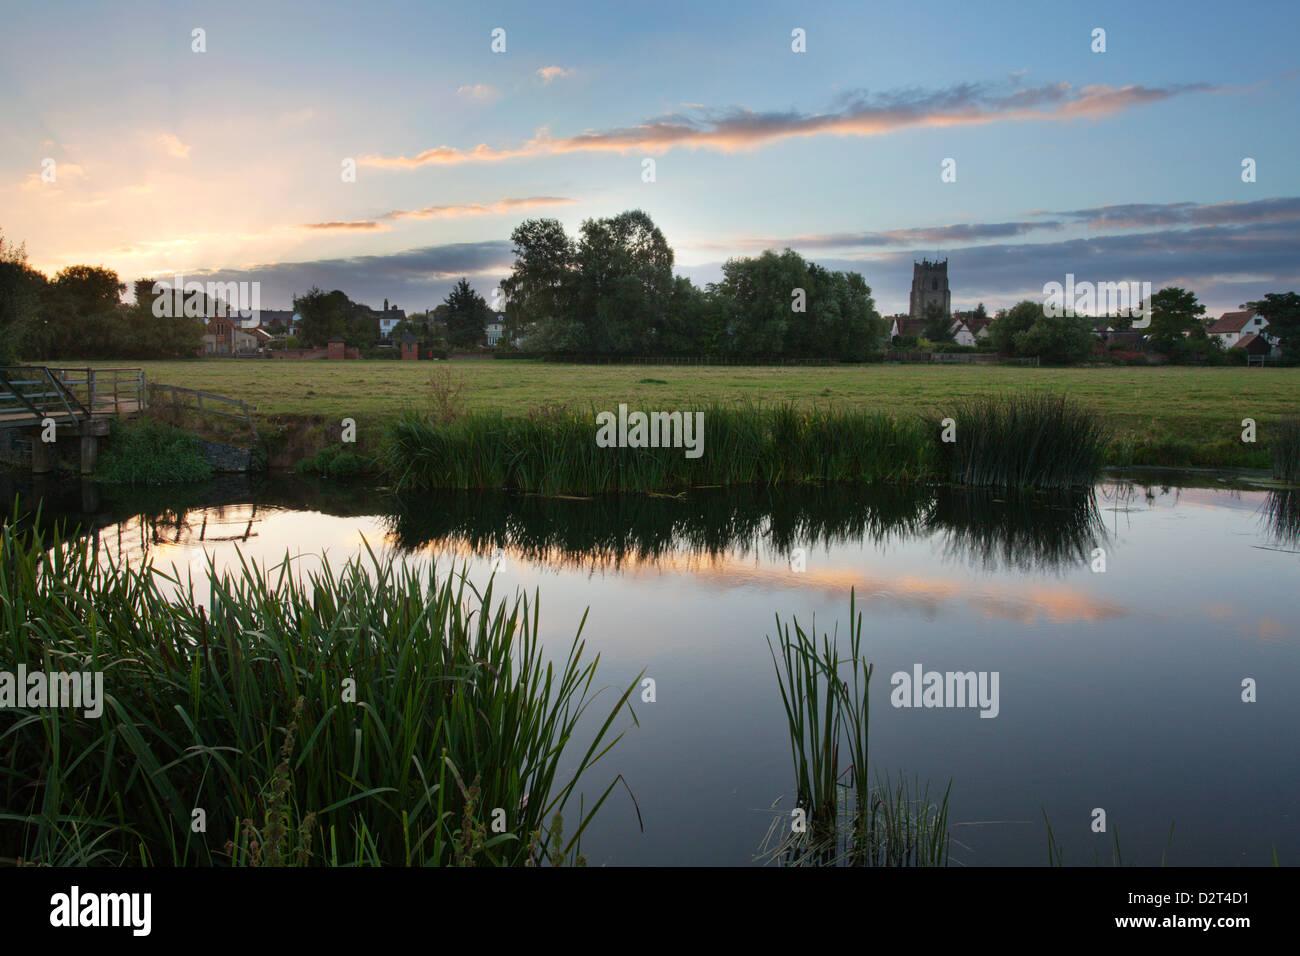 Sudbury Water Meadows at dawn, Sudbury, Suffolk, England, United Kingdom, Europe - Stock Image